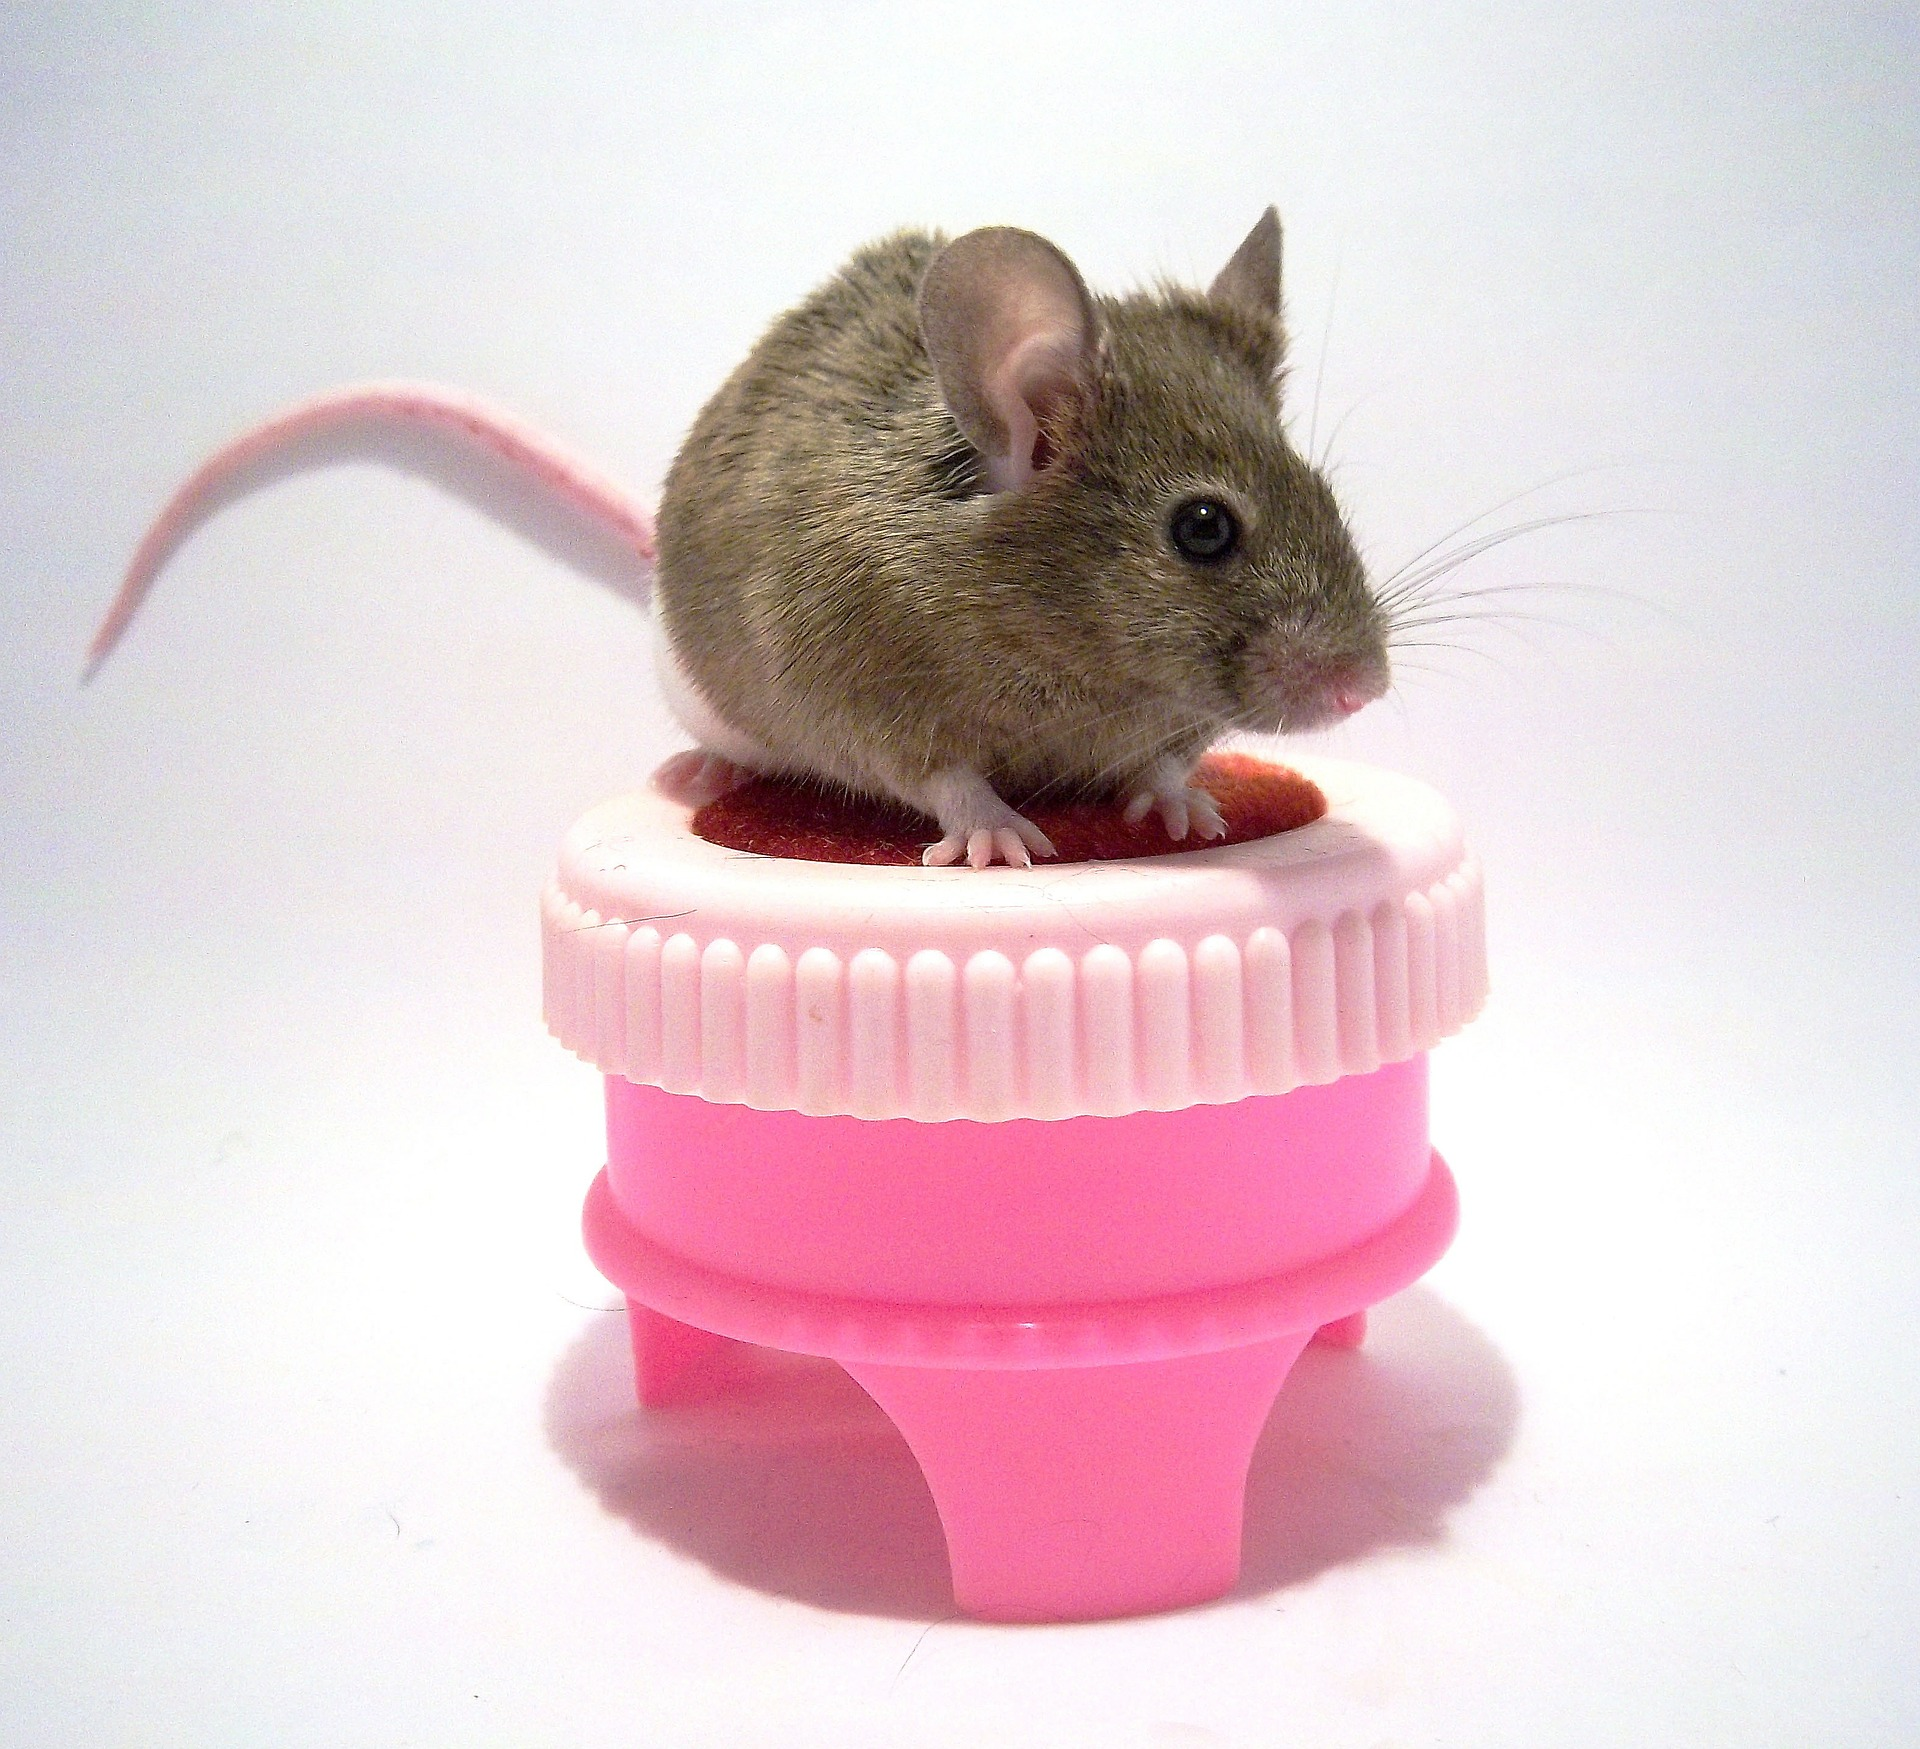 mouse430219-1452606416-70.jpg